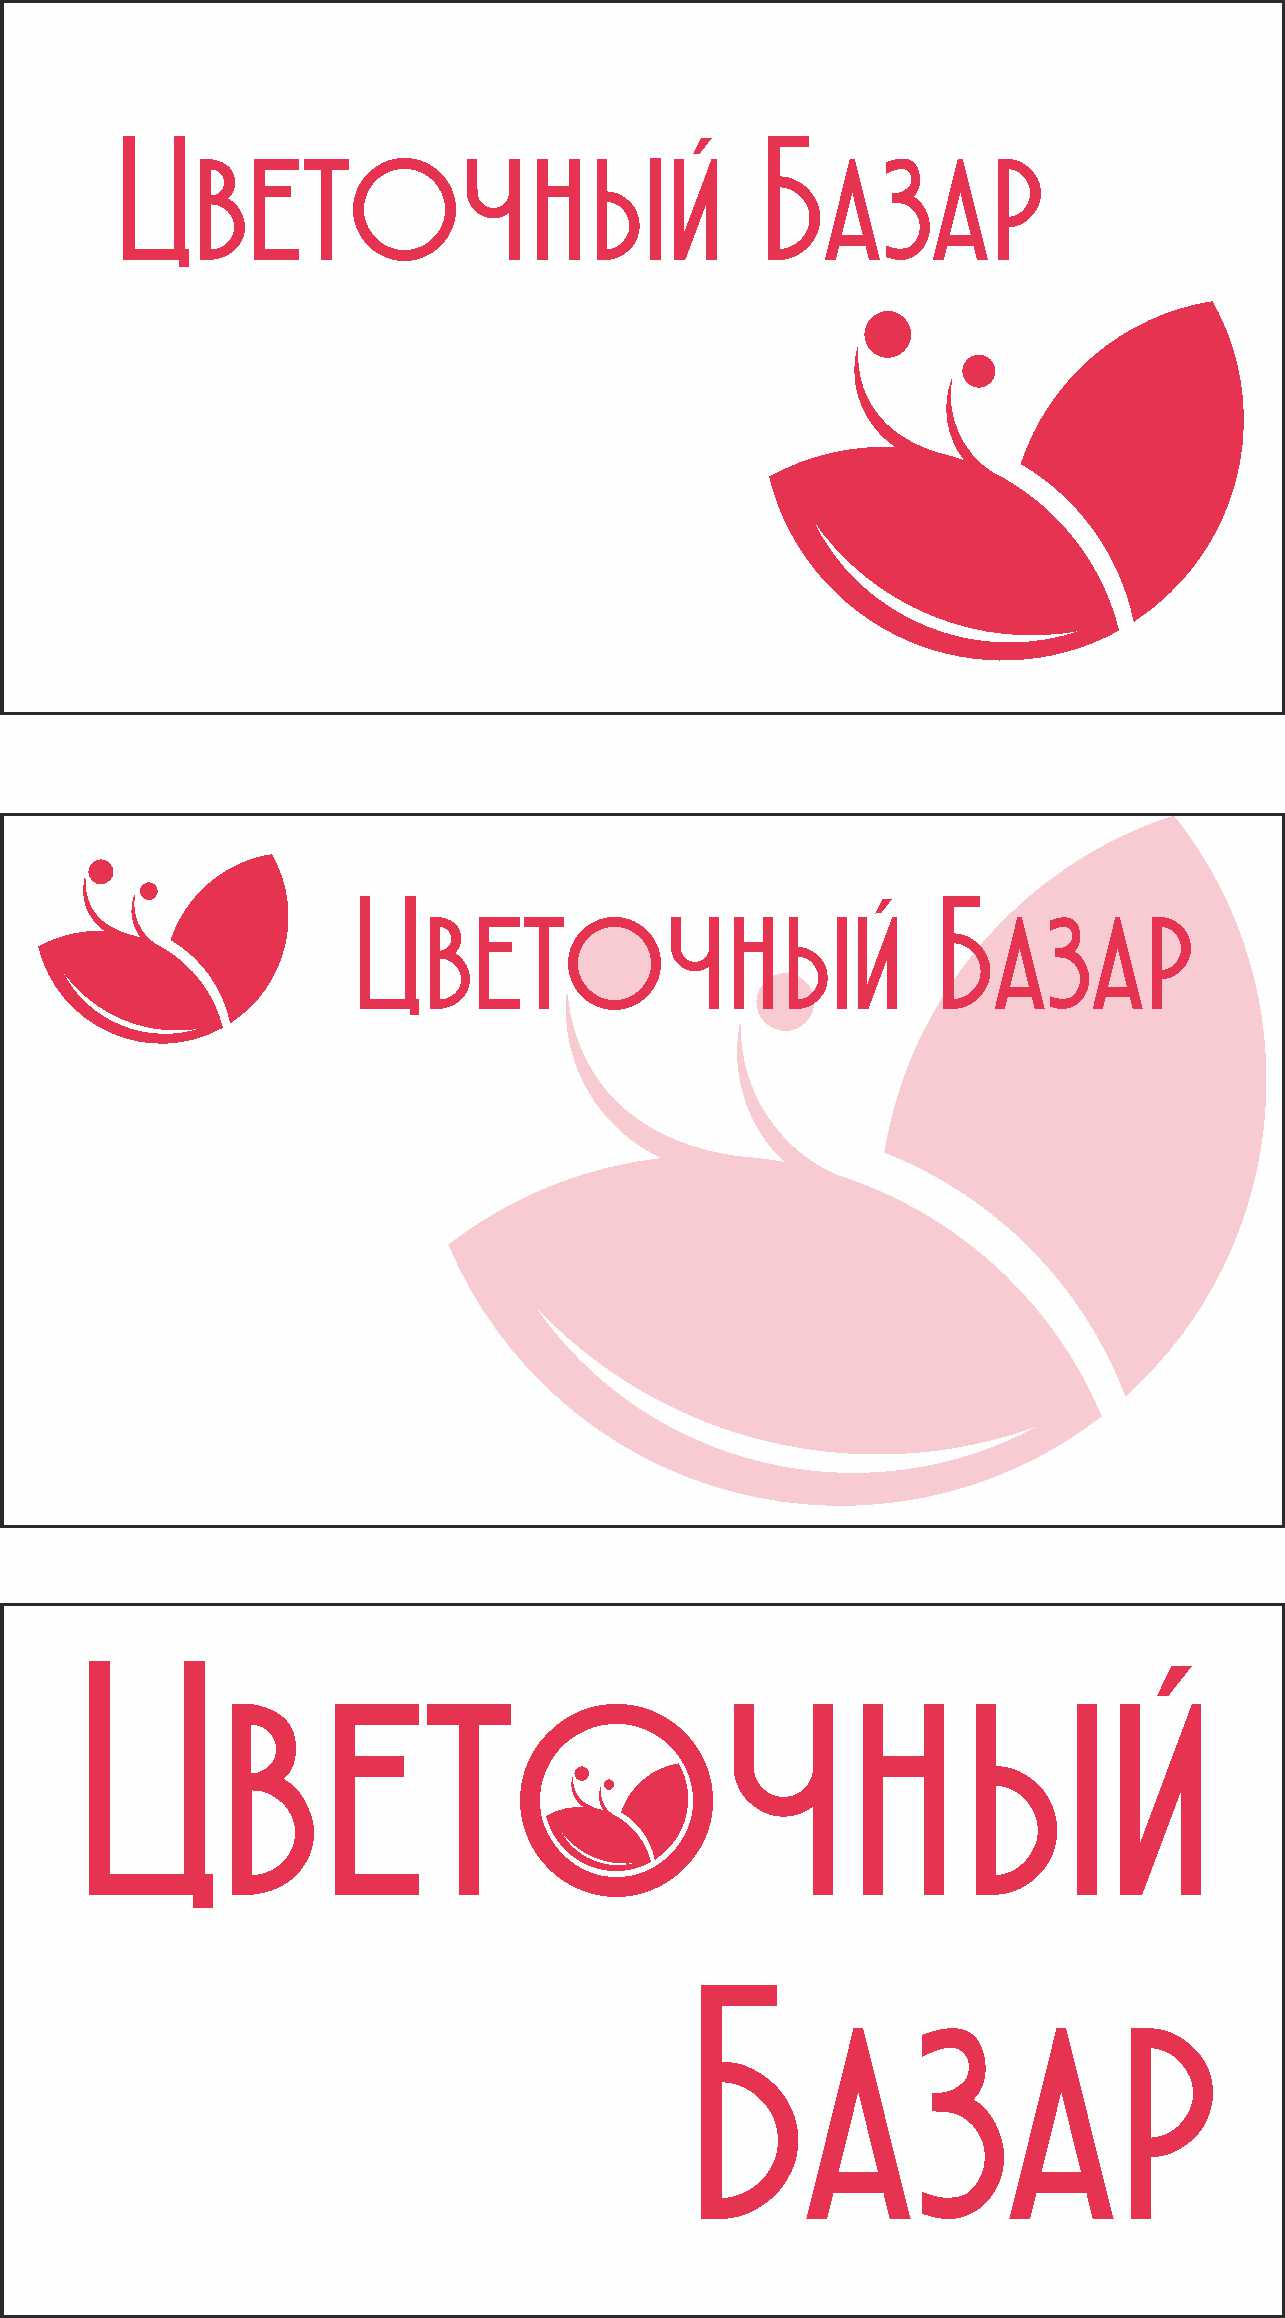 Разработка фирменного стиля для цветочного салона фото f_0845c34847b89f0f.jpg